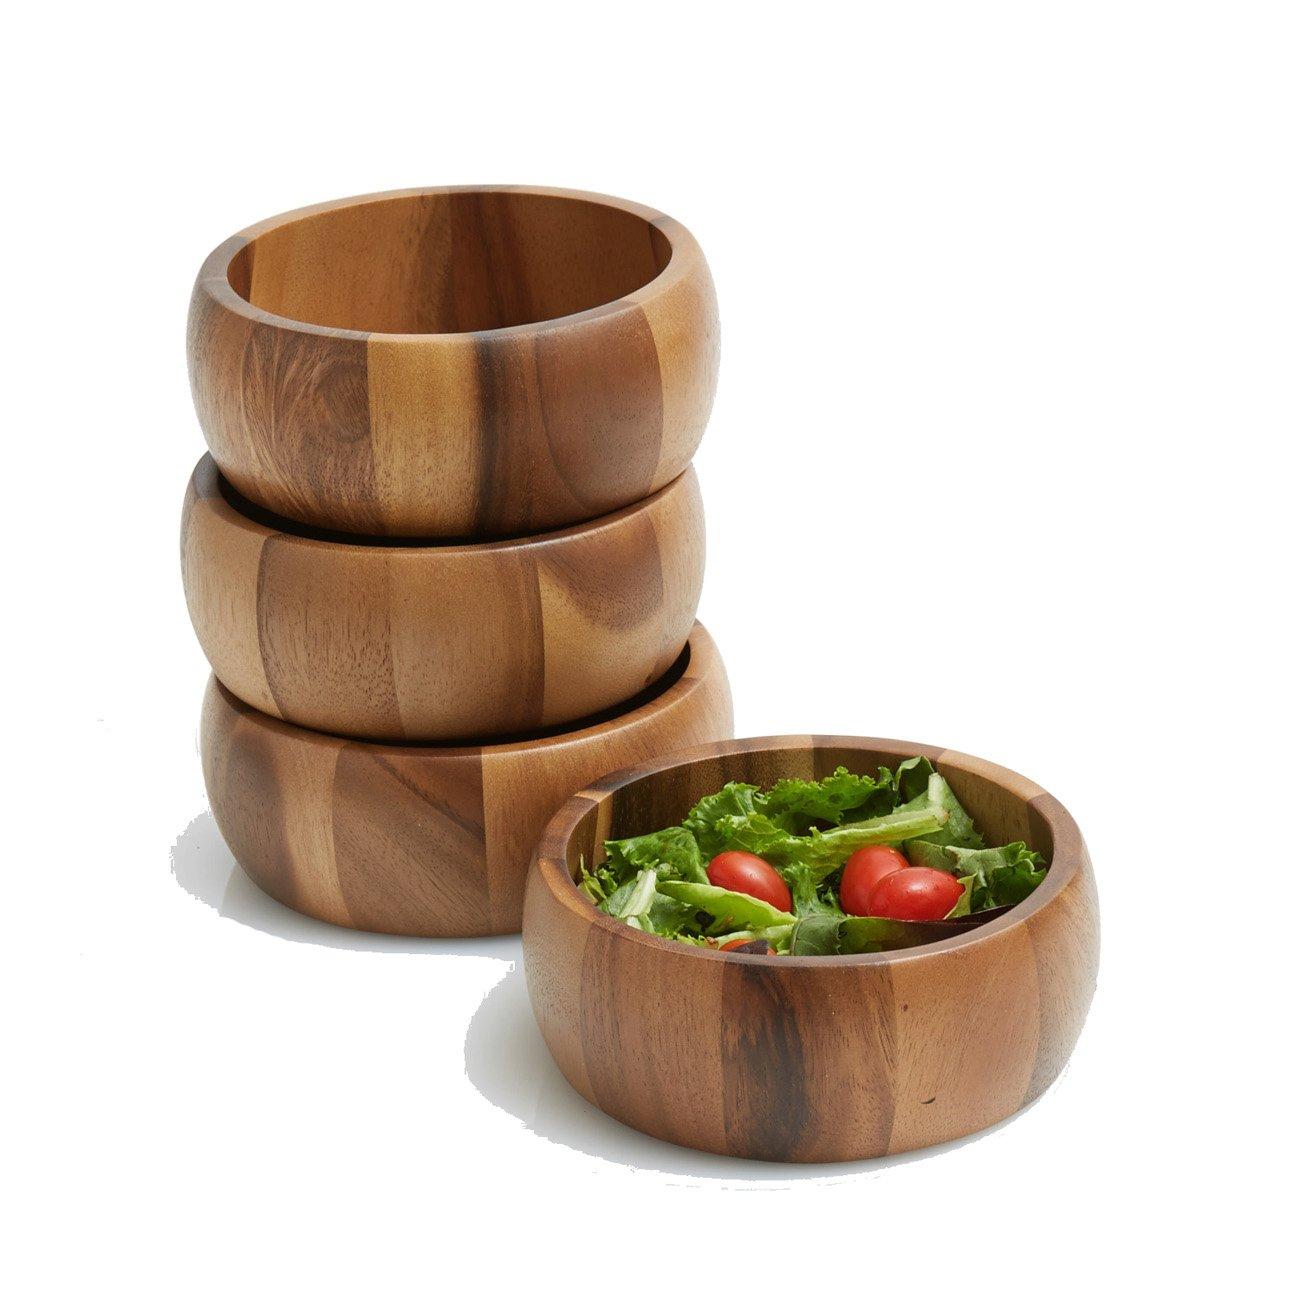 6.5 x 2.5 Snack Serving Bowls Woodard /& Charles WTT207N-4 Acacia Wood Large Individual Salad